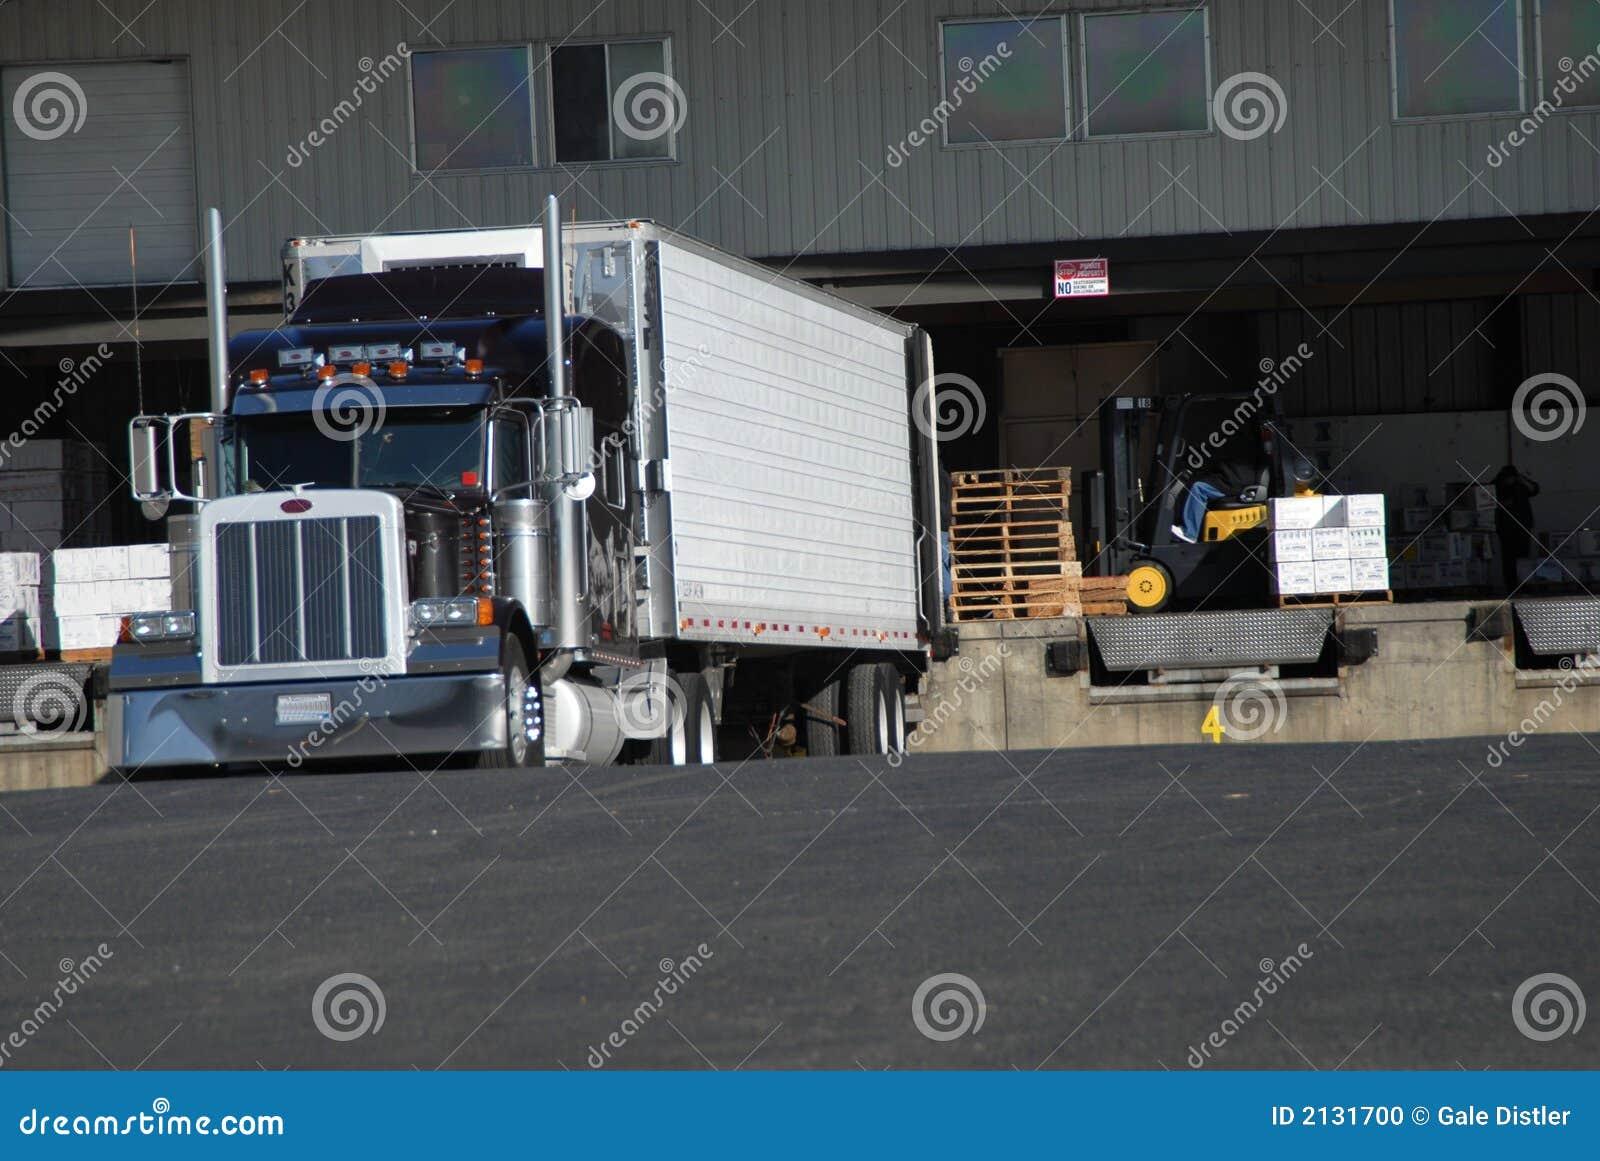 Truck loading